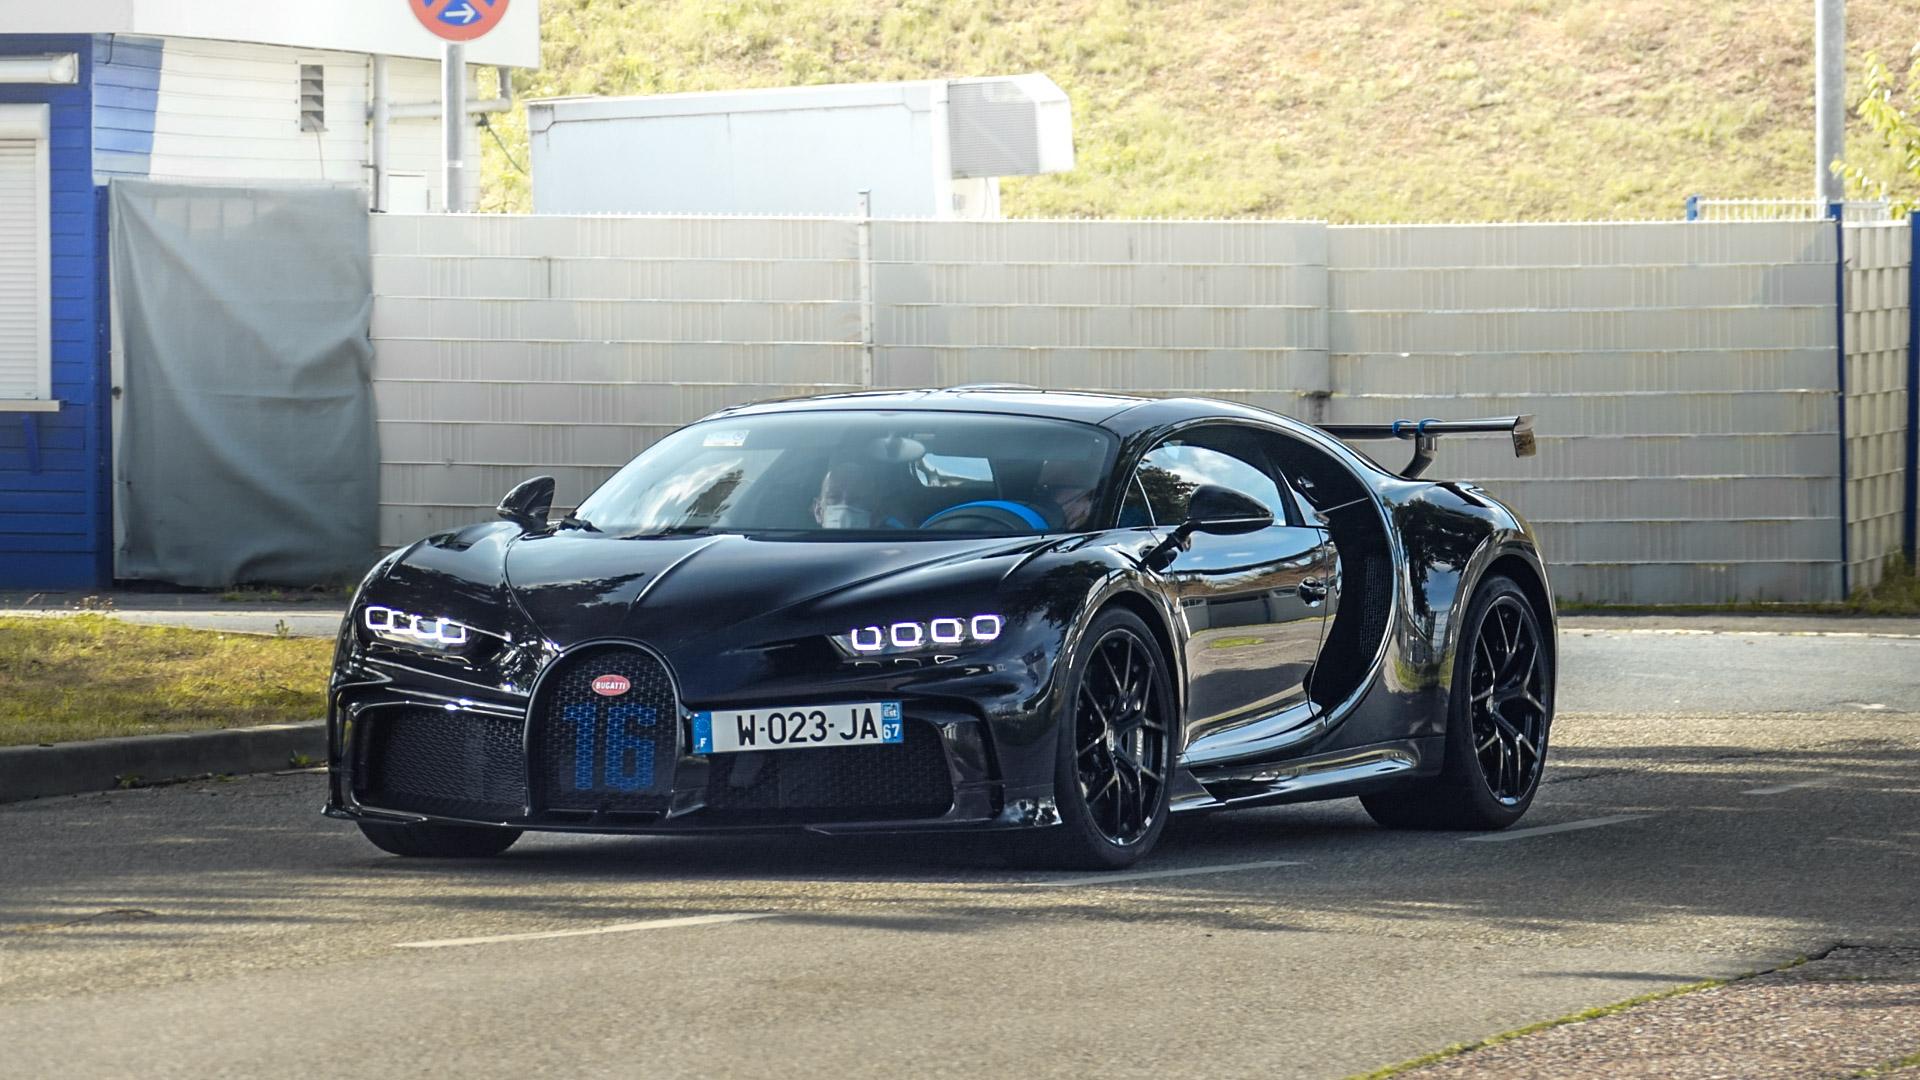 Bugatti Chiron Pur Sport - W-023-JA-67 (FRA)